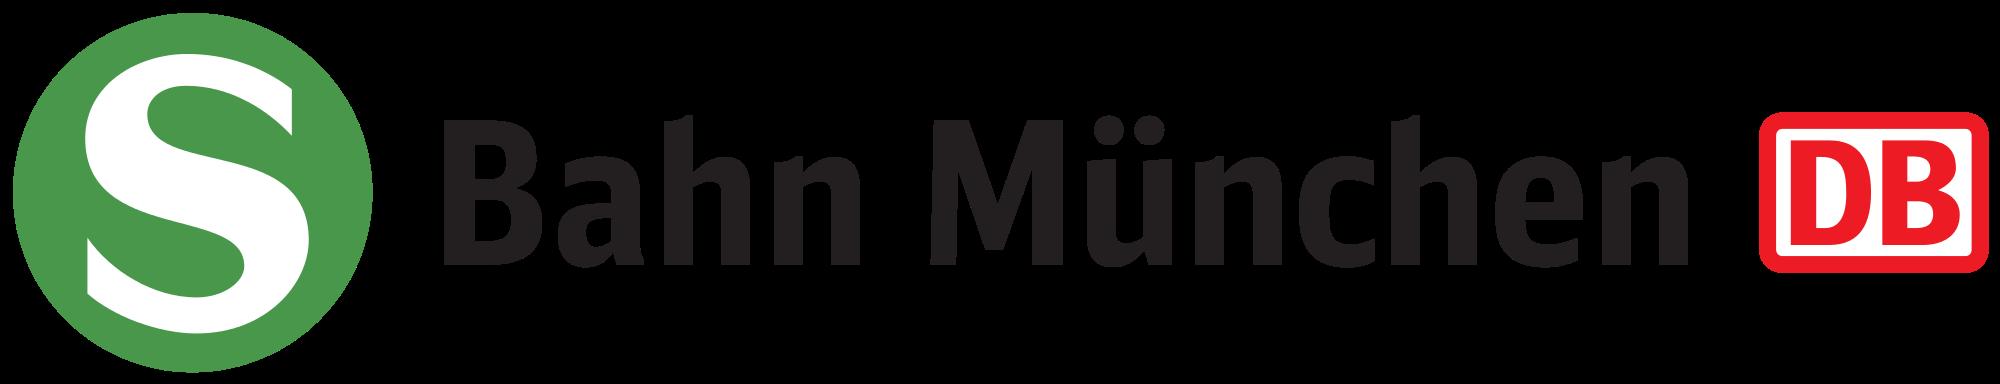 S-Bahn_München_Logo_svg